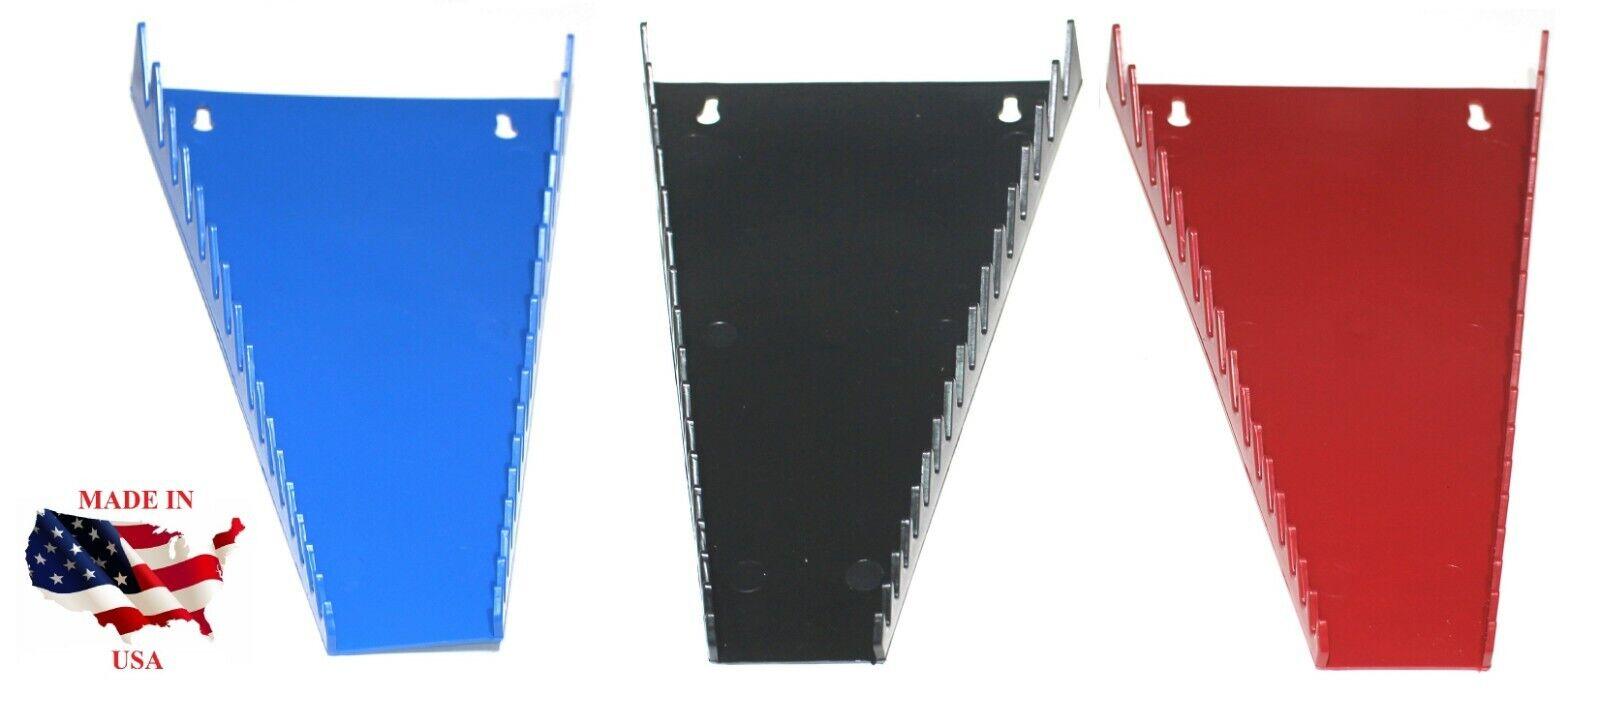 16 wrench holder organizer storage rack tray